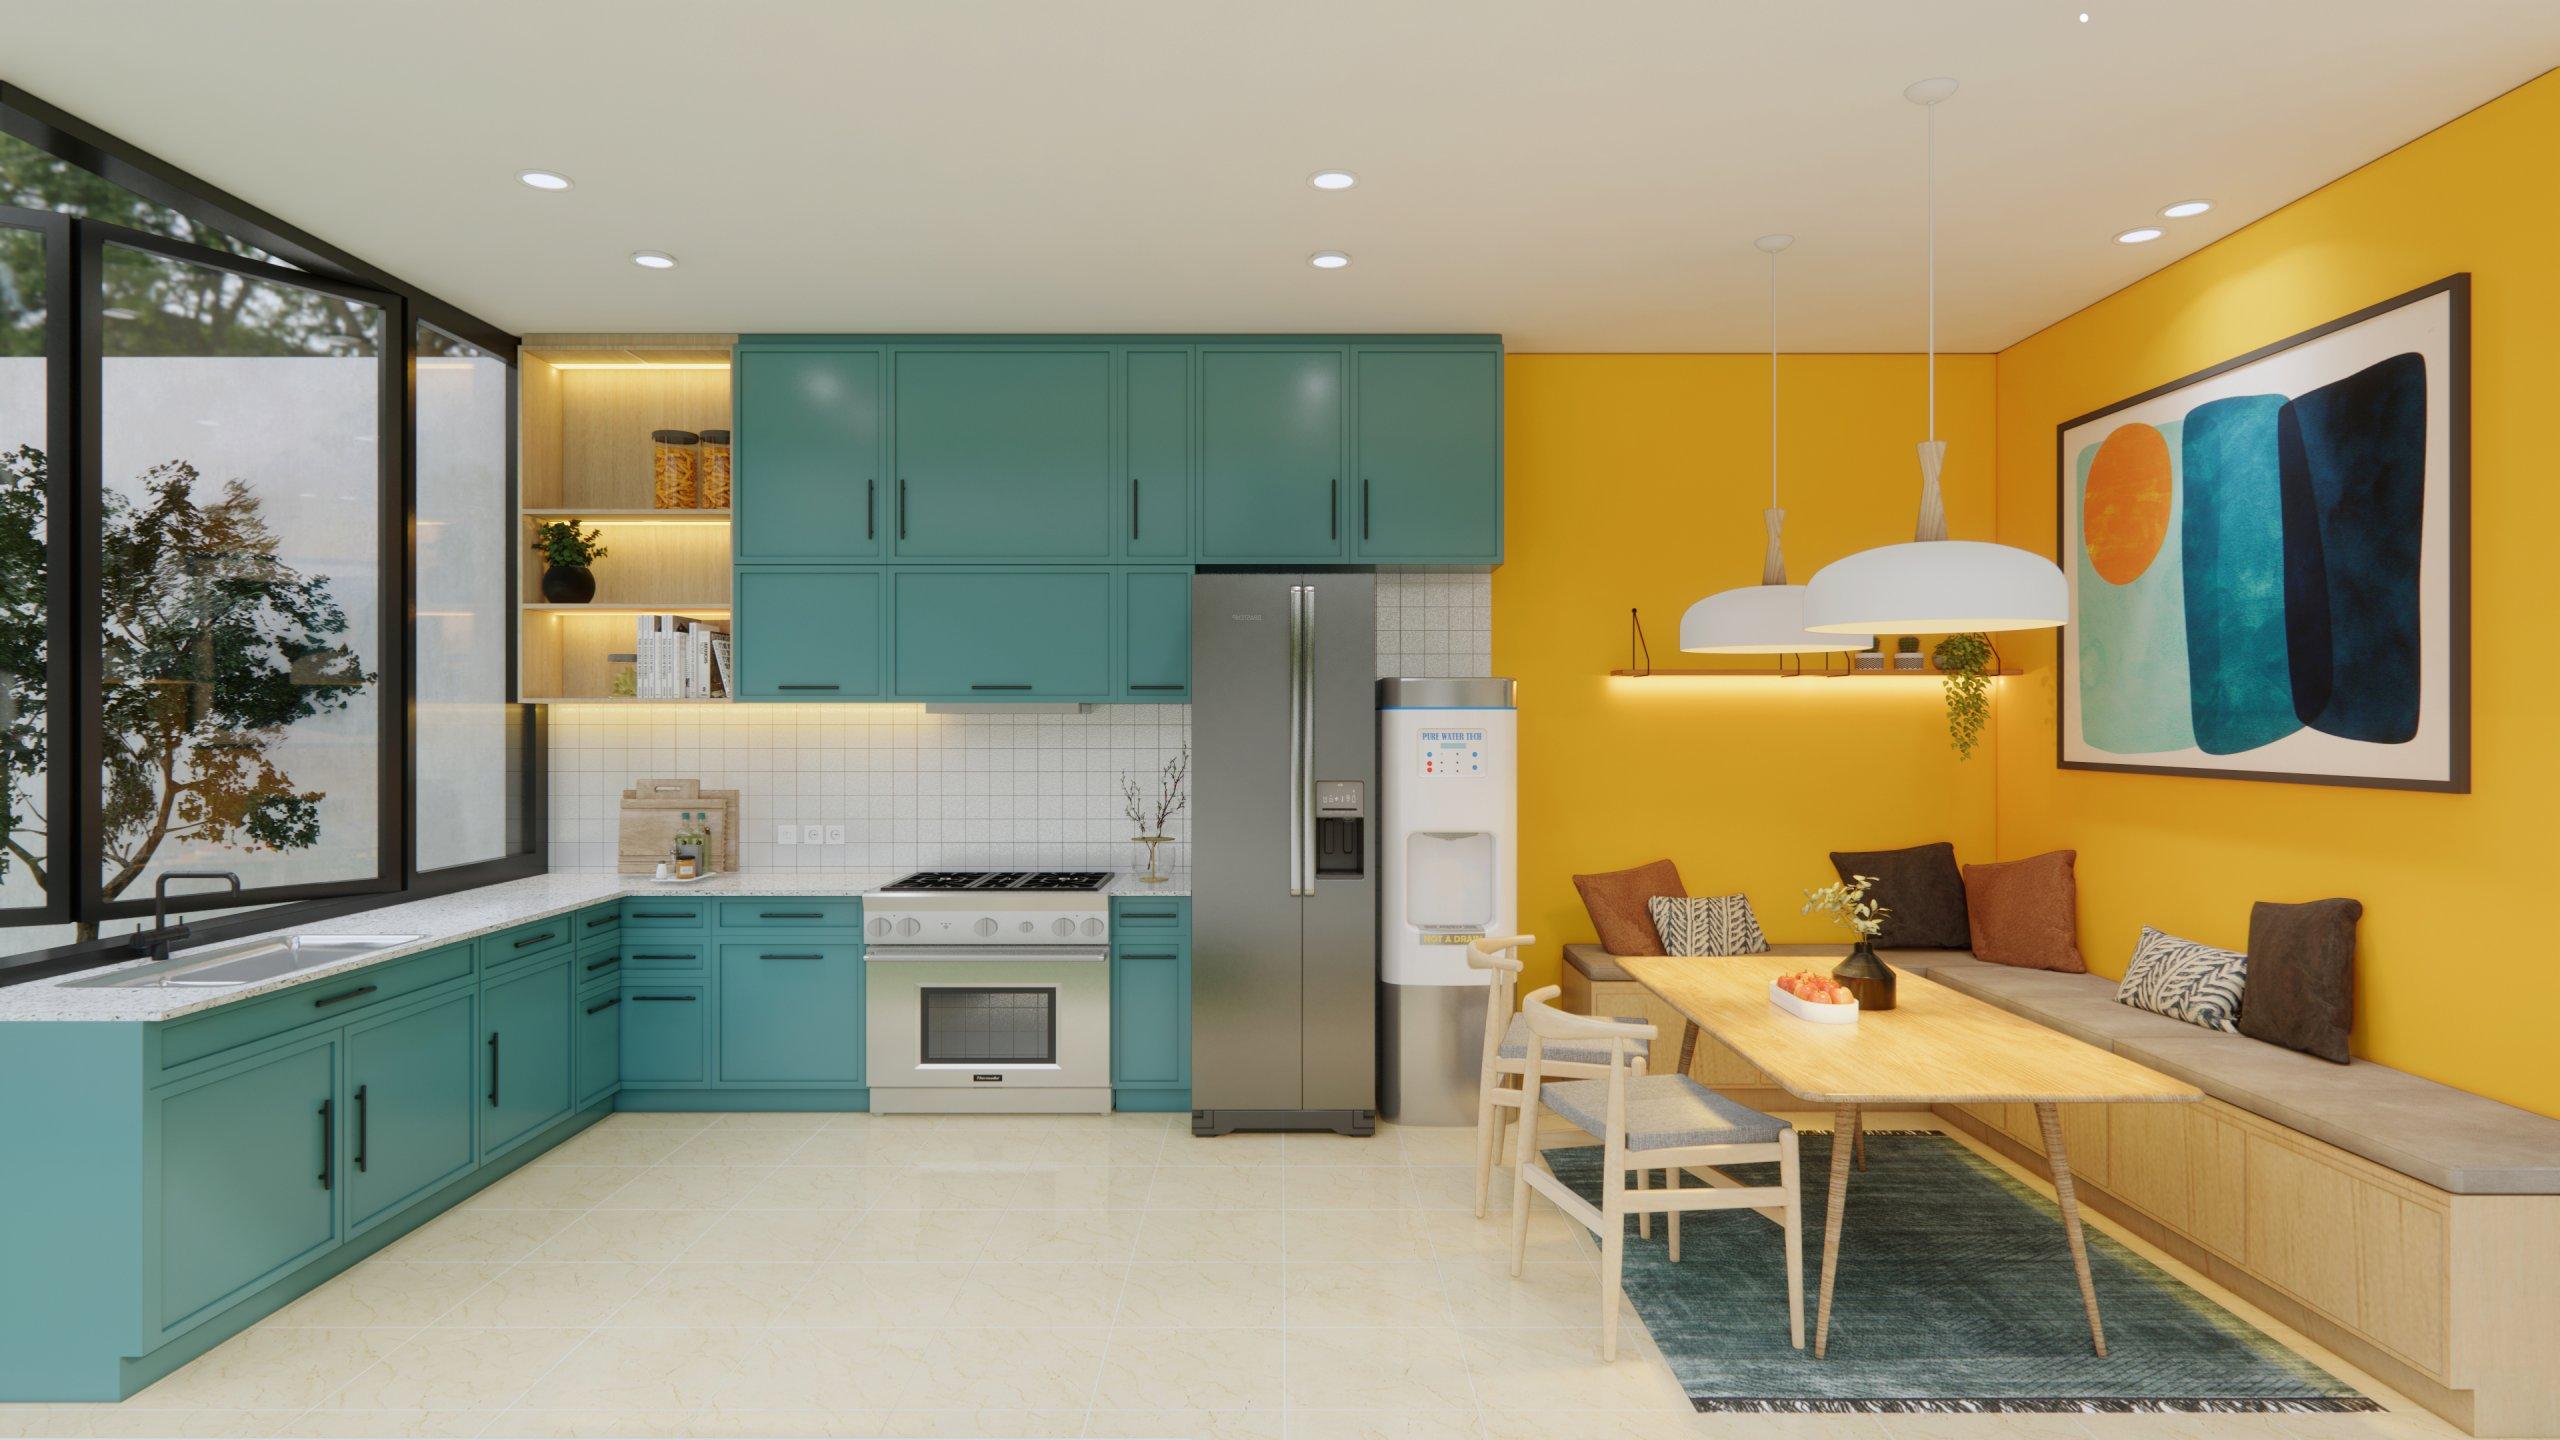 Pilihan Warna Cat Interior Rumah Mengenal Tipe Warna Dan Psikologi Warna Interiordesign Id Warna cat rumah makan